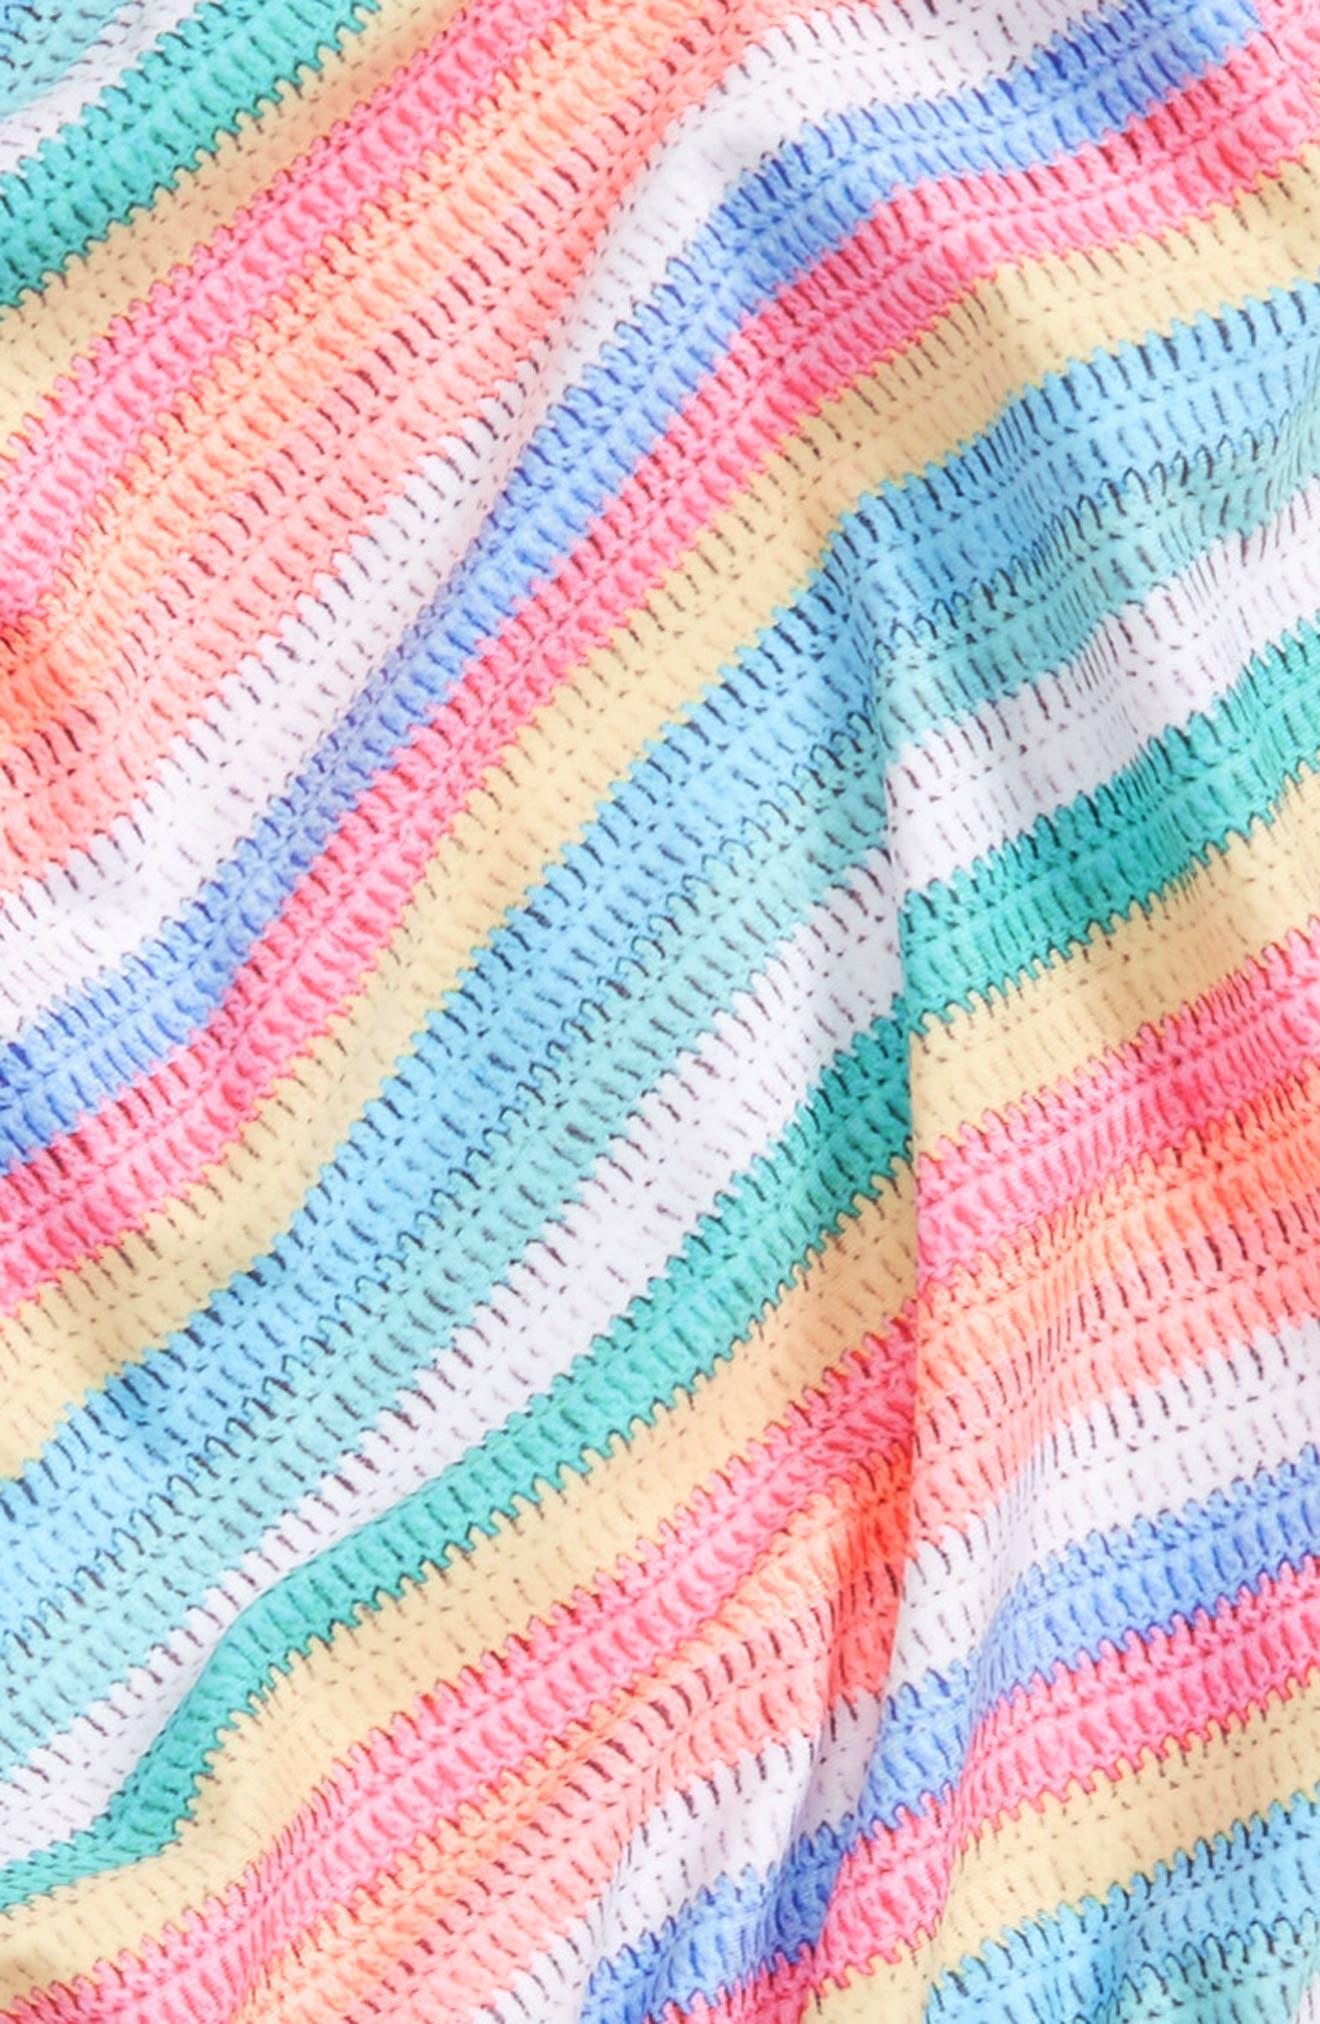 Candy Pop One-Piece Swimsuit,                             Alternate thumbnail 2, color,                             650